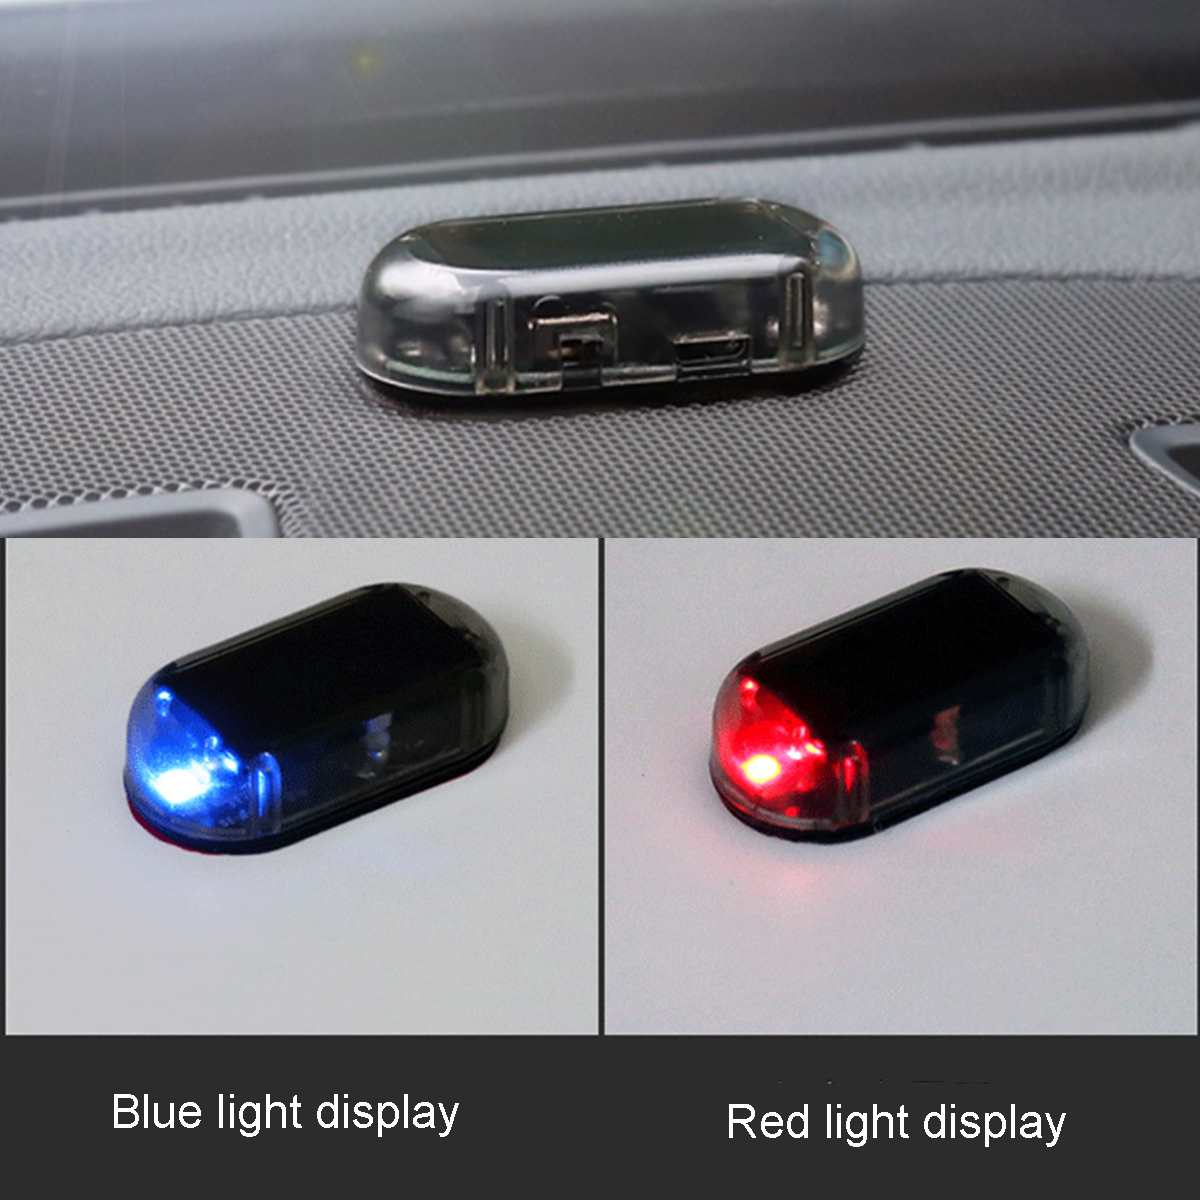 1 Pair Of Car Solar LED Warning Flash Light Analog Alarm Anti-theft Lighting System Safety Light